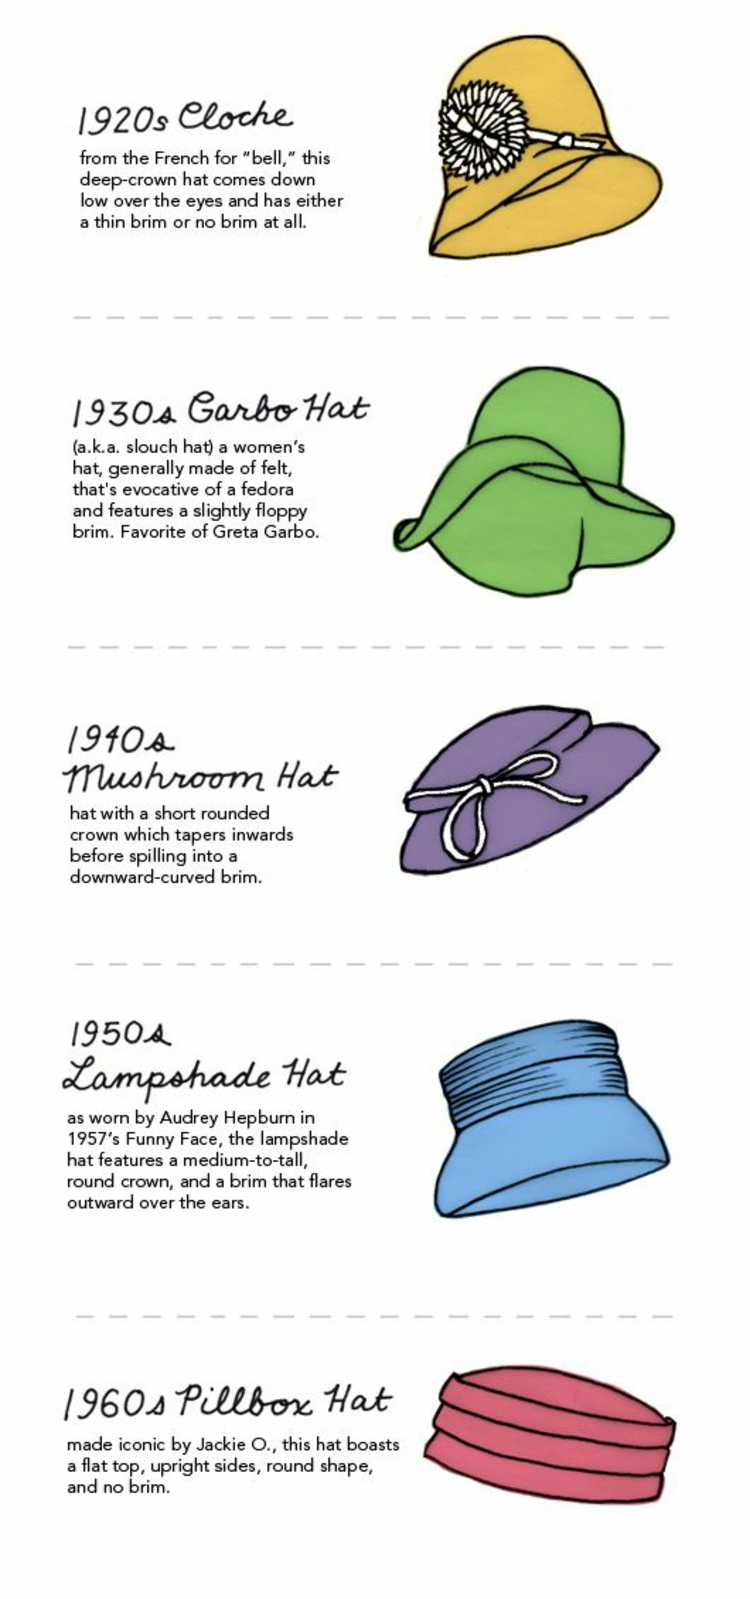 Damenhüte Damenmode und Stylingstipps Damenhut Geschichte